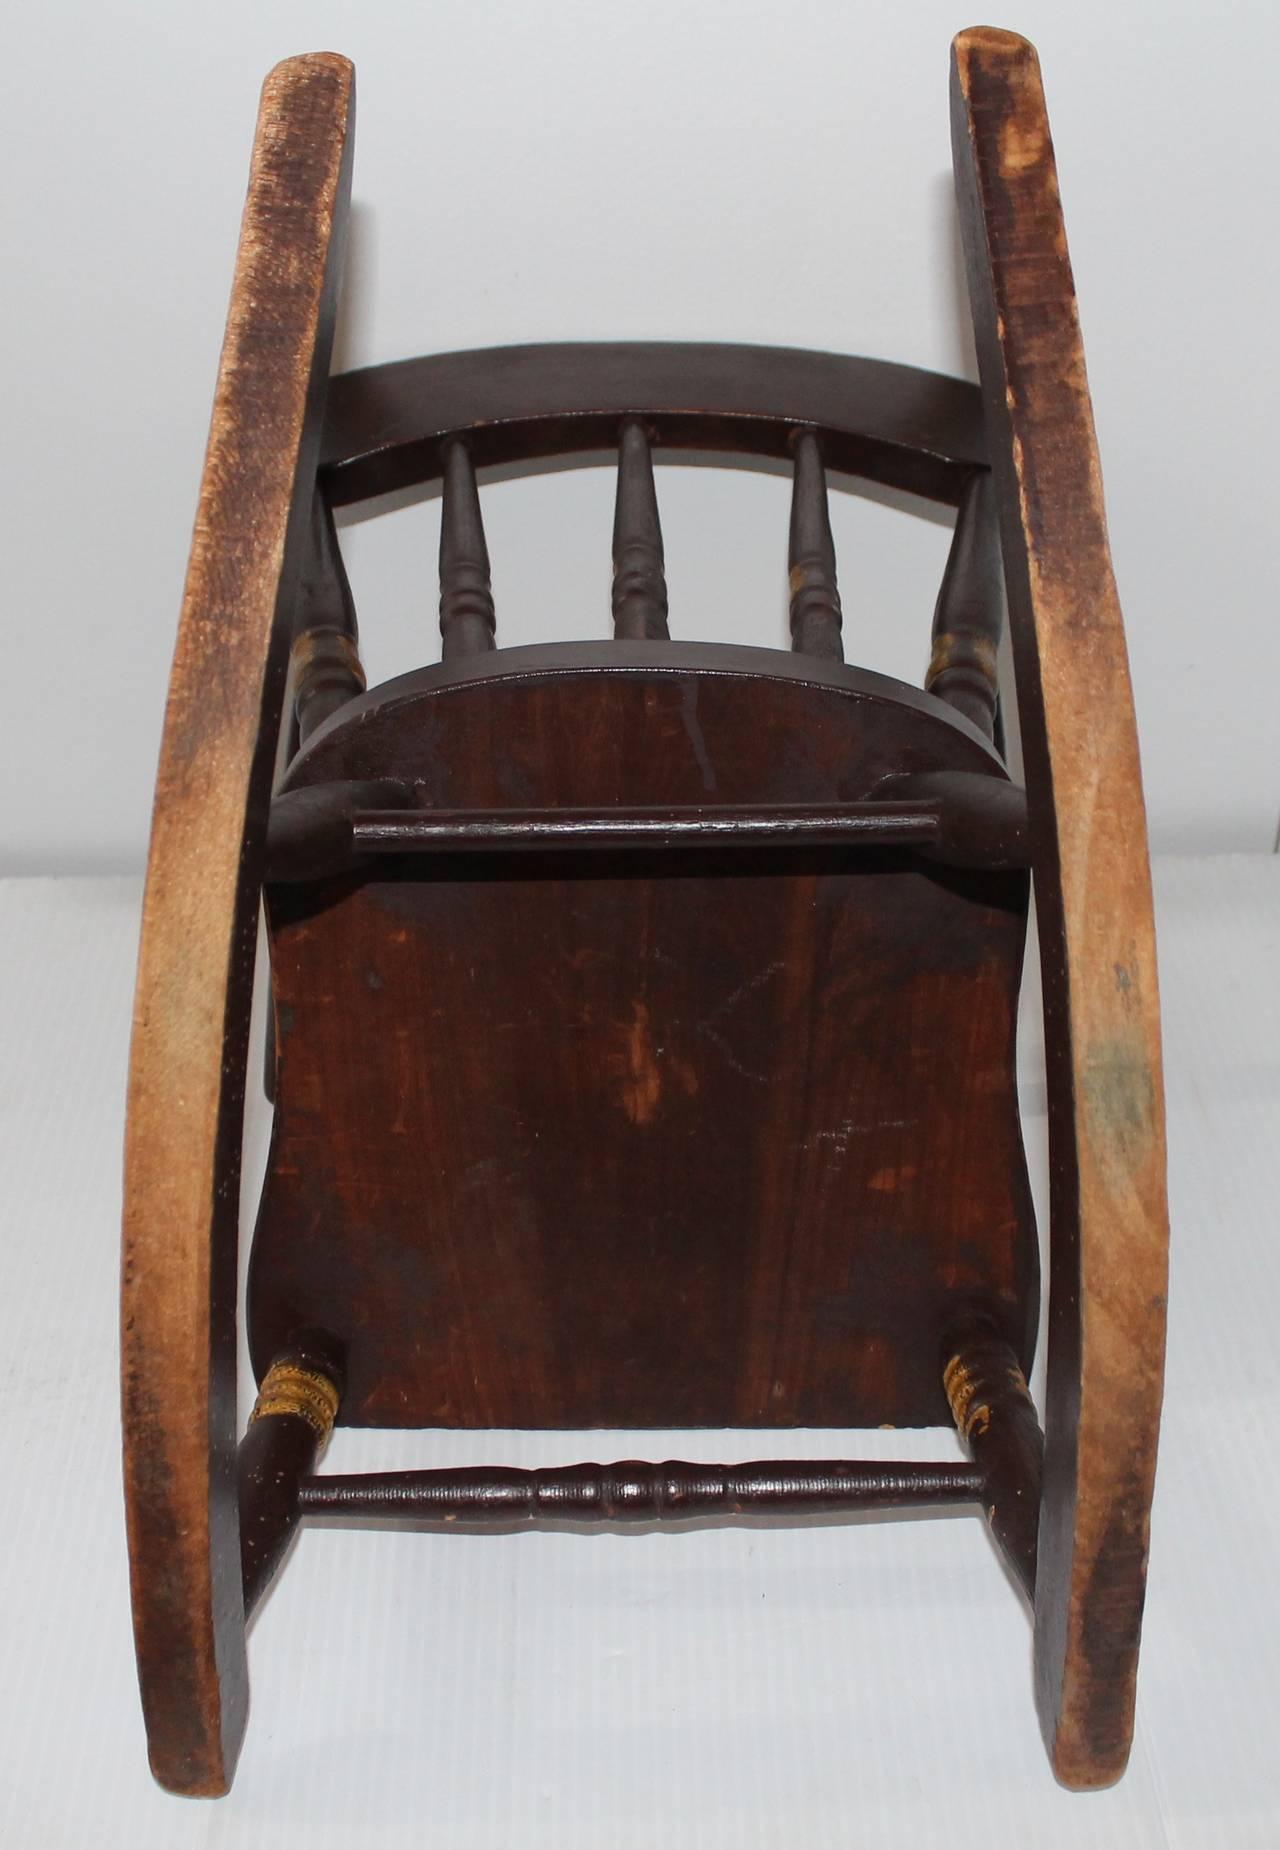 19th Century York County Pennsylvania Original Painted Child 39 S Rocking Chair Image 6